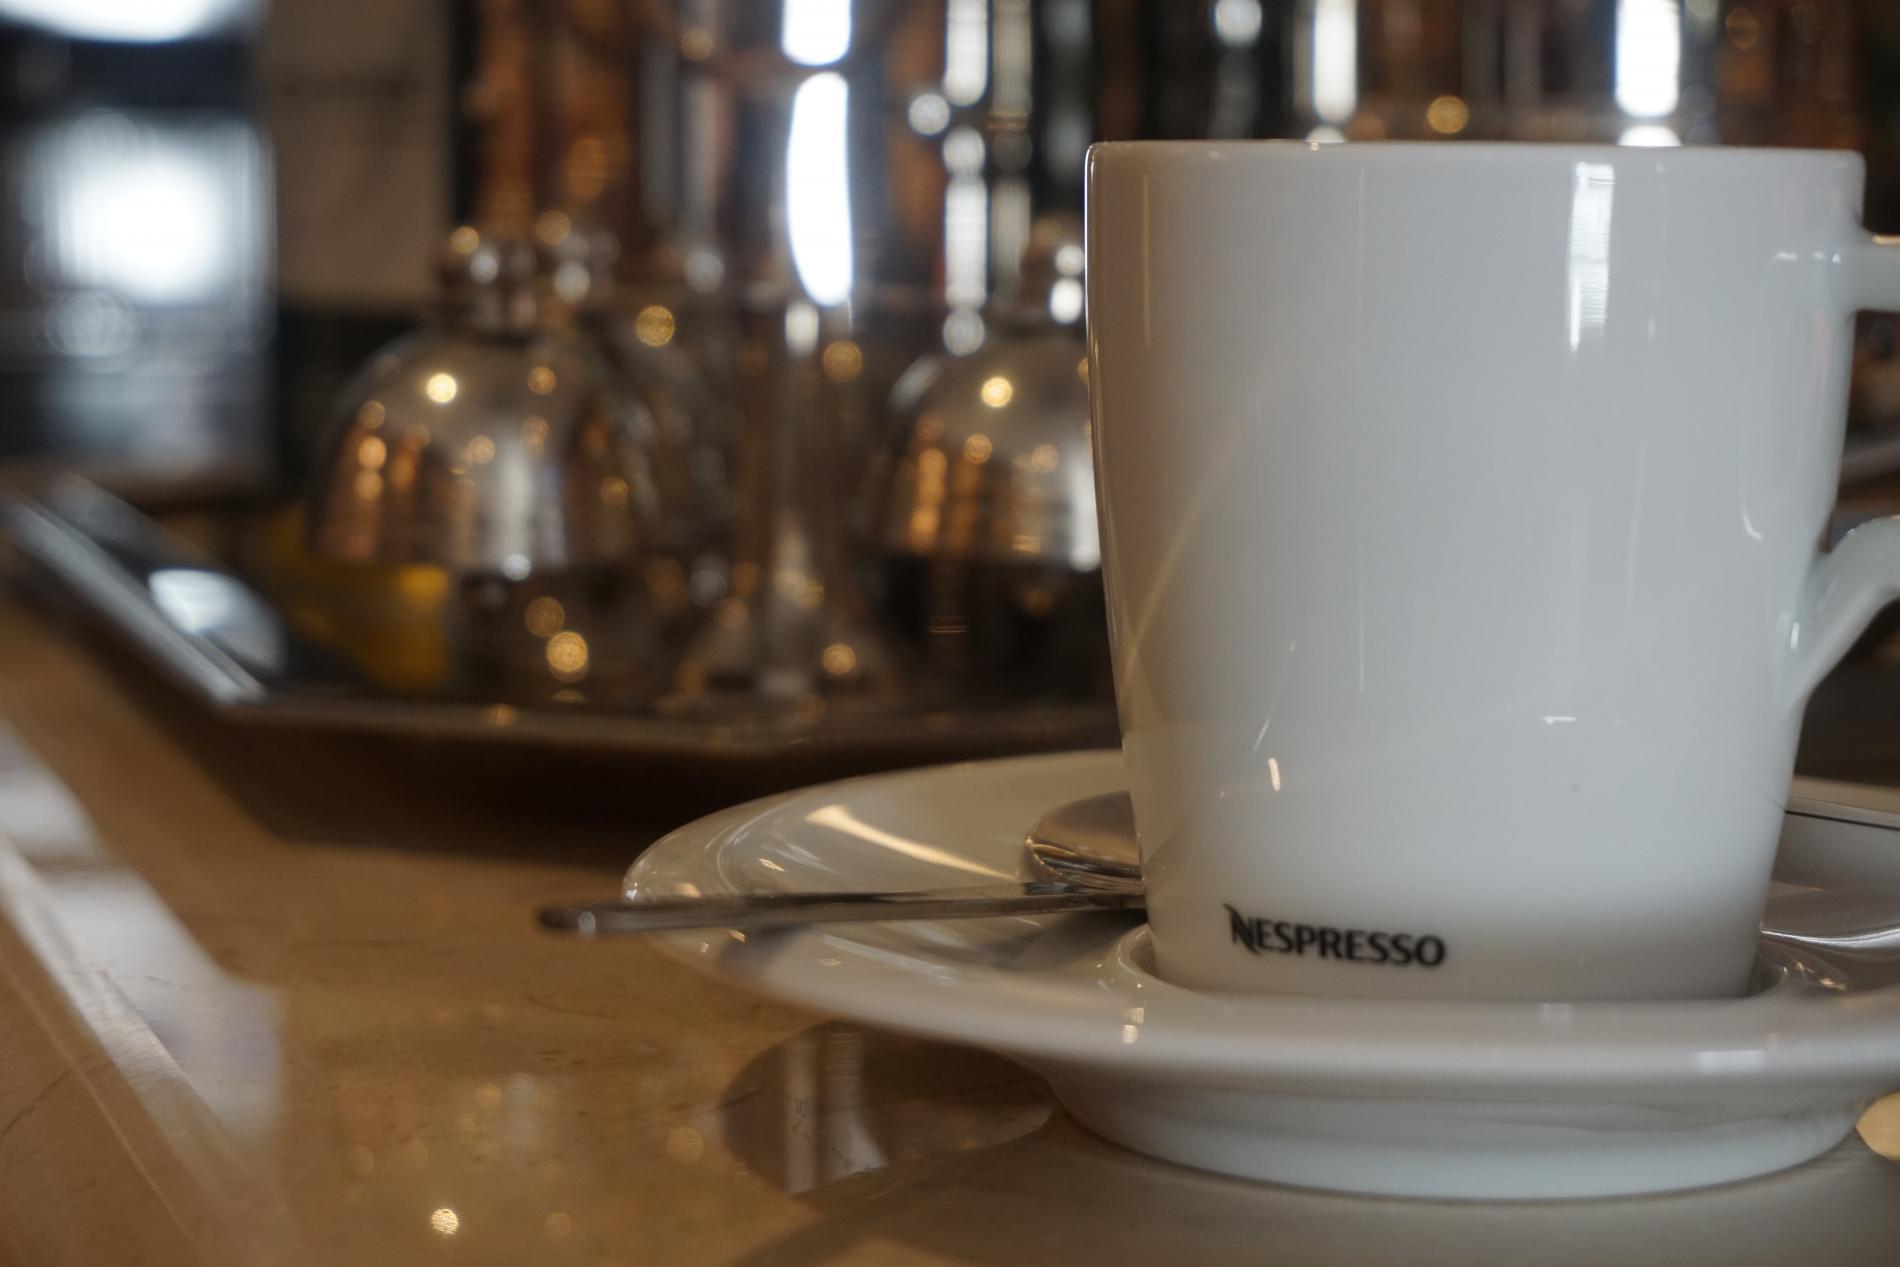 13 Grands Crus Nespresso au Bar de la Couronne